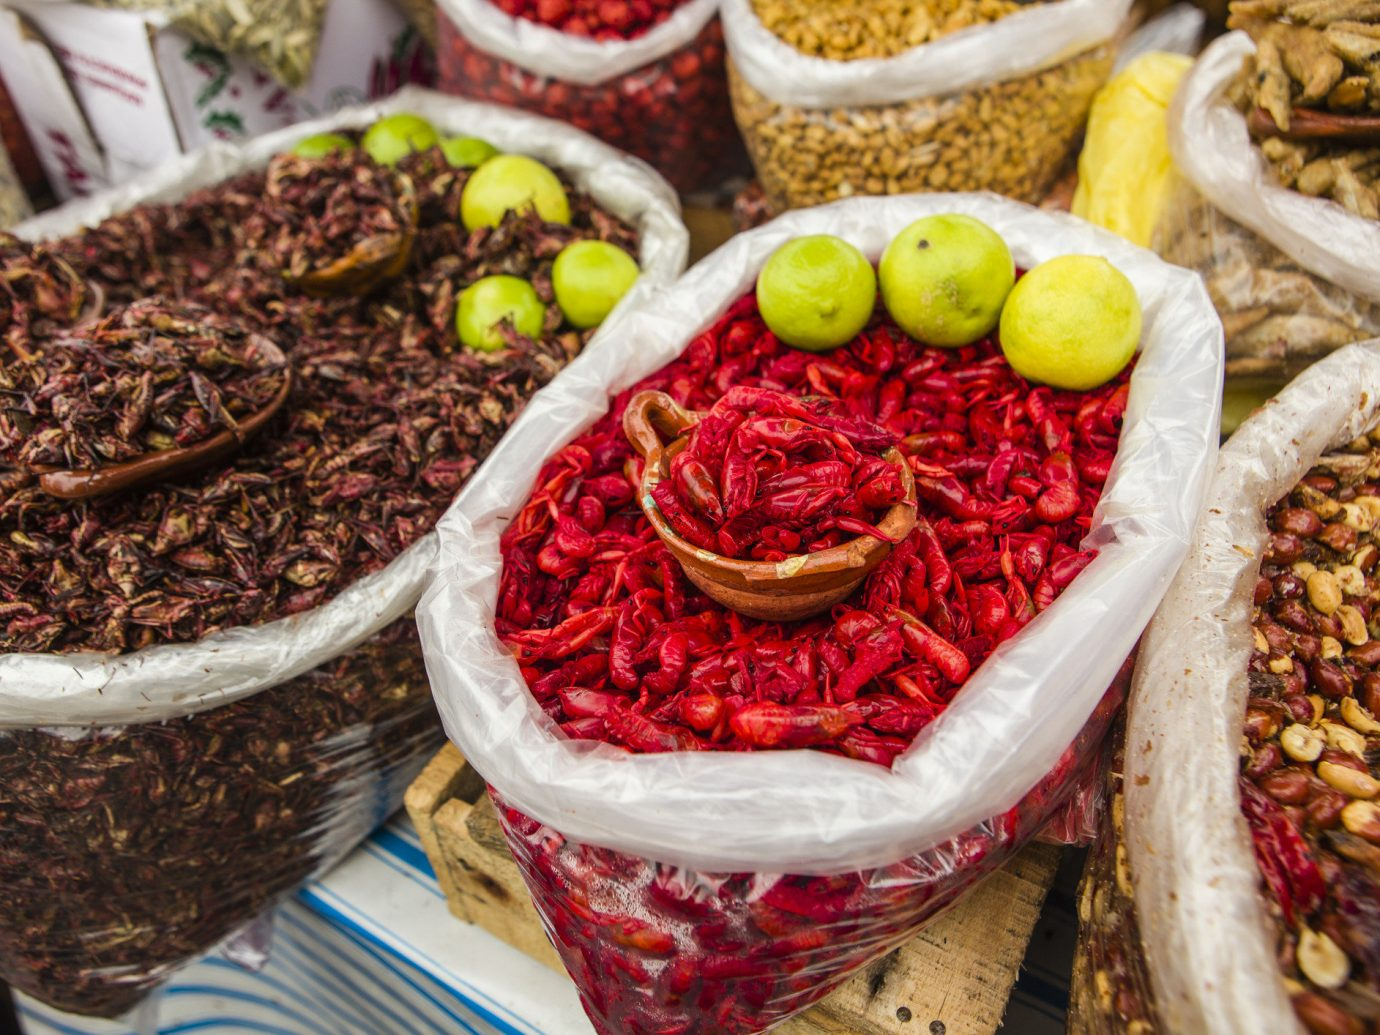 Trip Ideas food public space City market plant human settlement produce dish seafood boil flavor flower vegetable meal